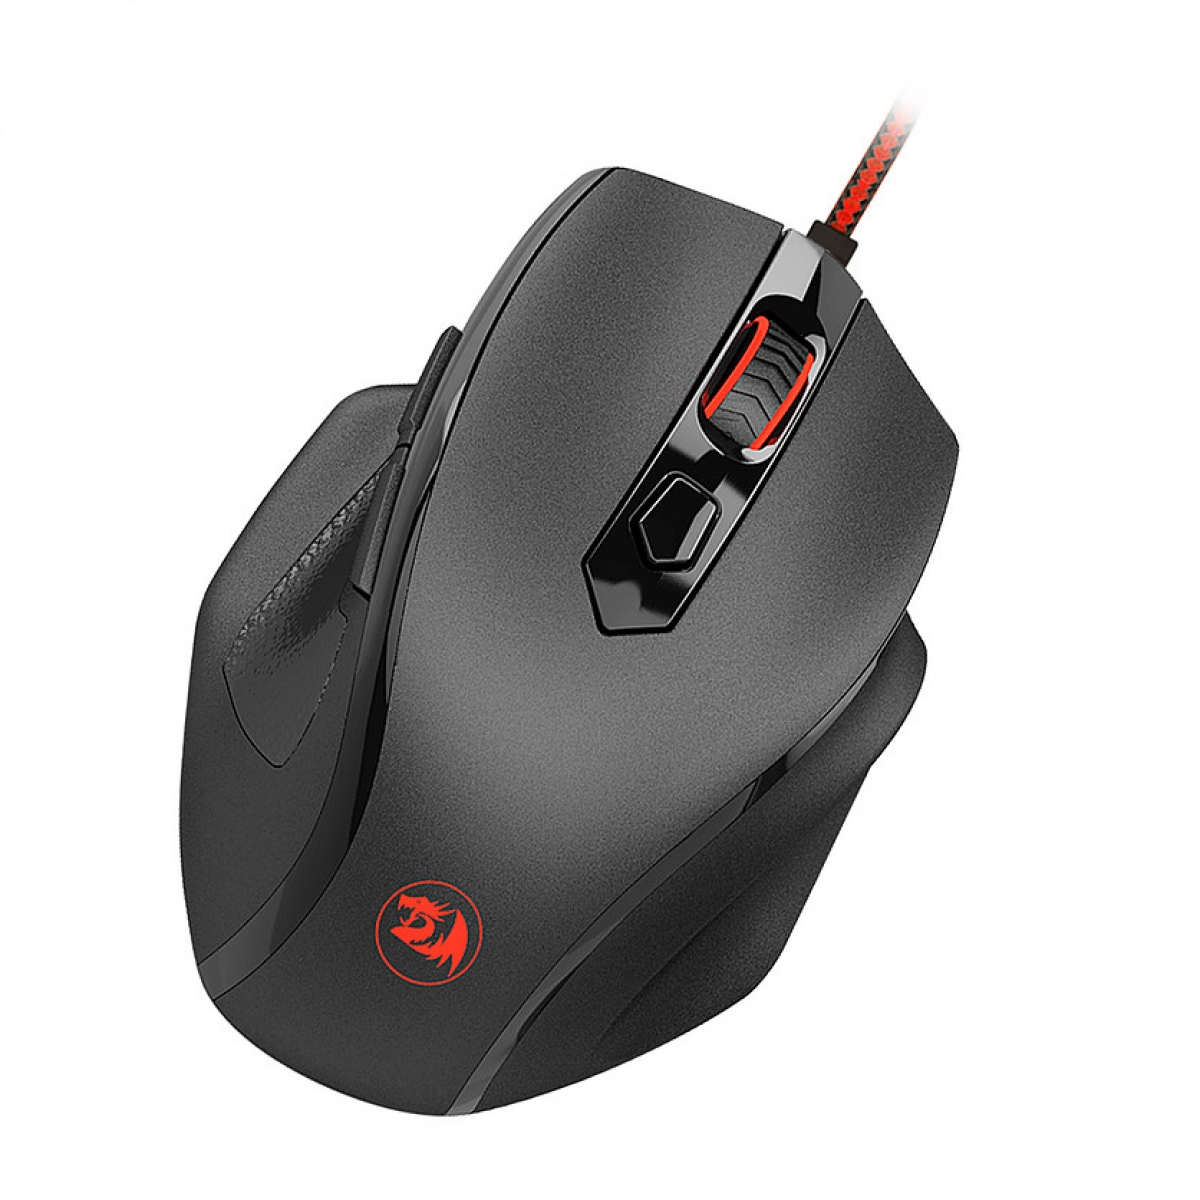 Mouse Gamer Redragon Tiger M709 RGB, 10000 DPI, 6 Botões, Black